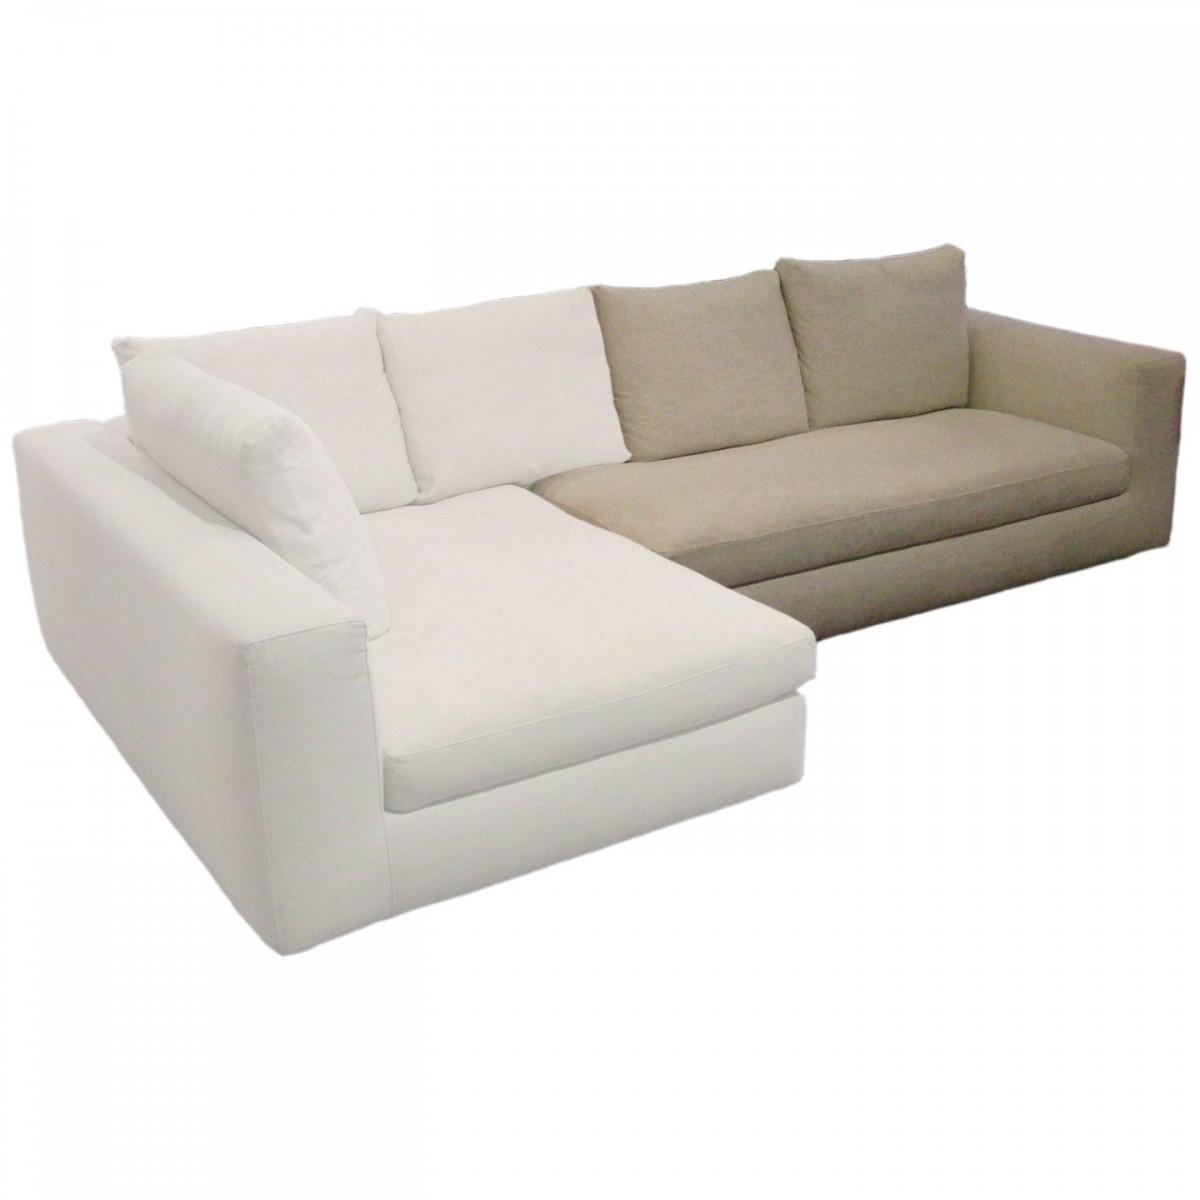 Marea 1 Arm Sofa 188X108Cm With Gordon Arm Sofa Chairs (View 19 of 25)